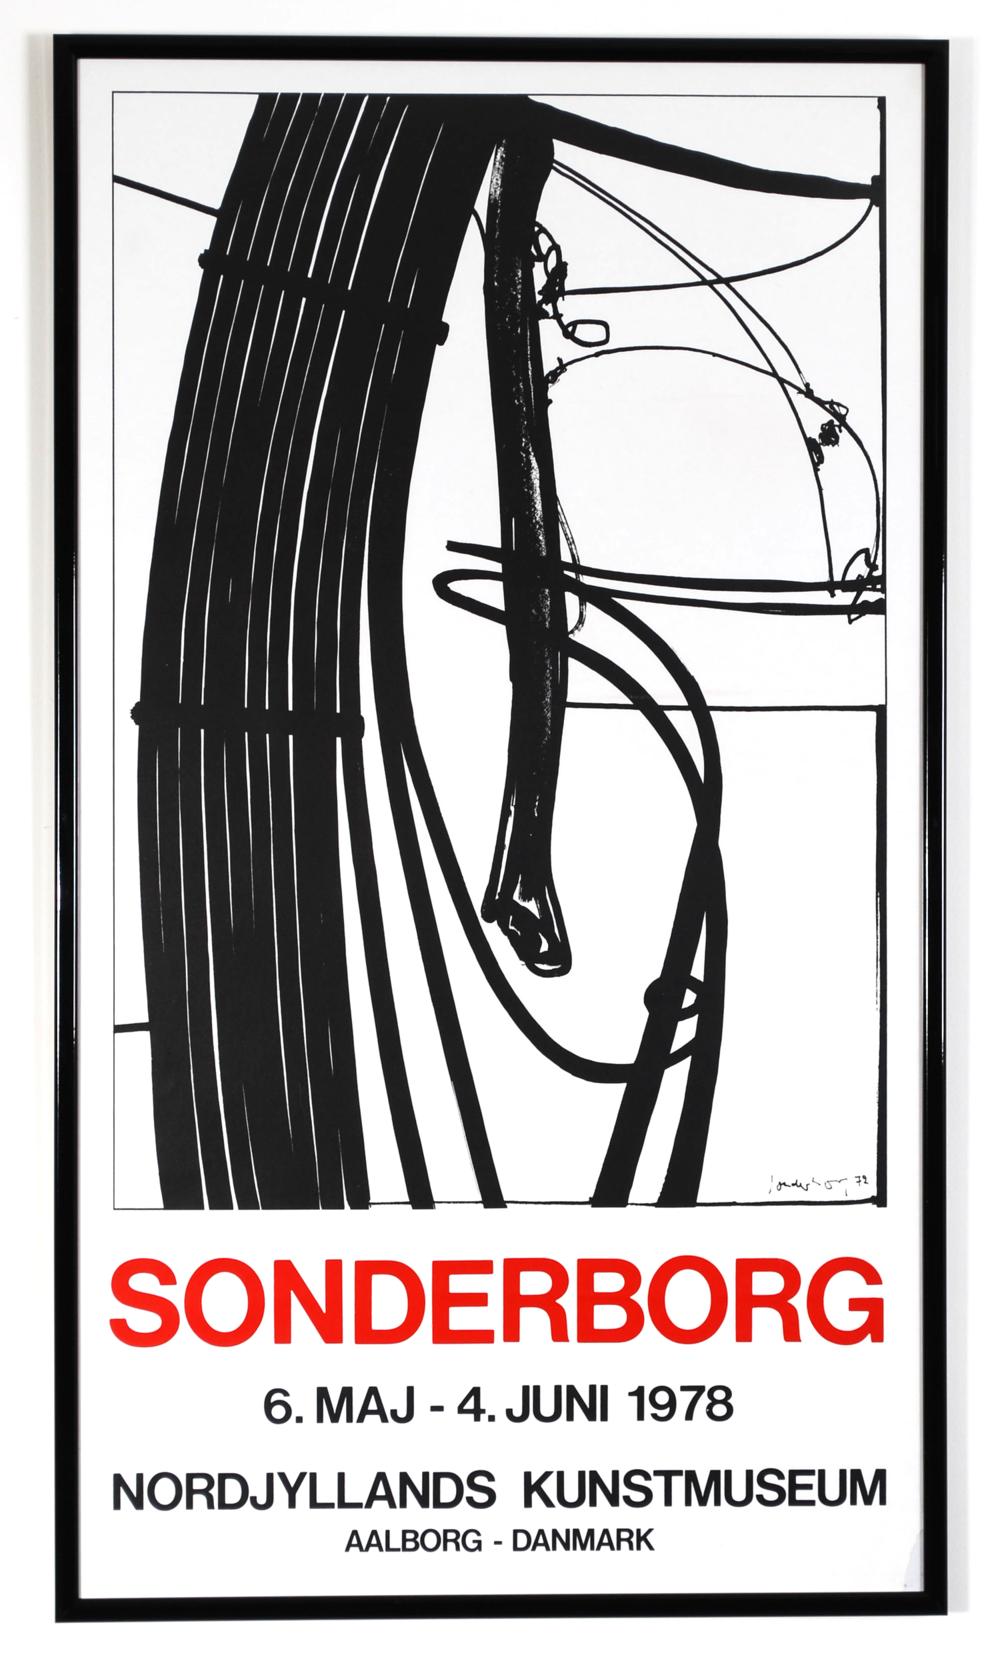 Original poster Sonderborg - Nordjyllands Kunstmuseum - Aalborg Danmark - 1978